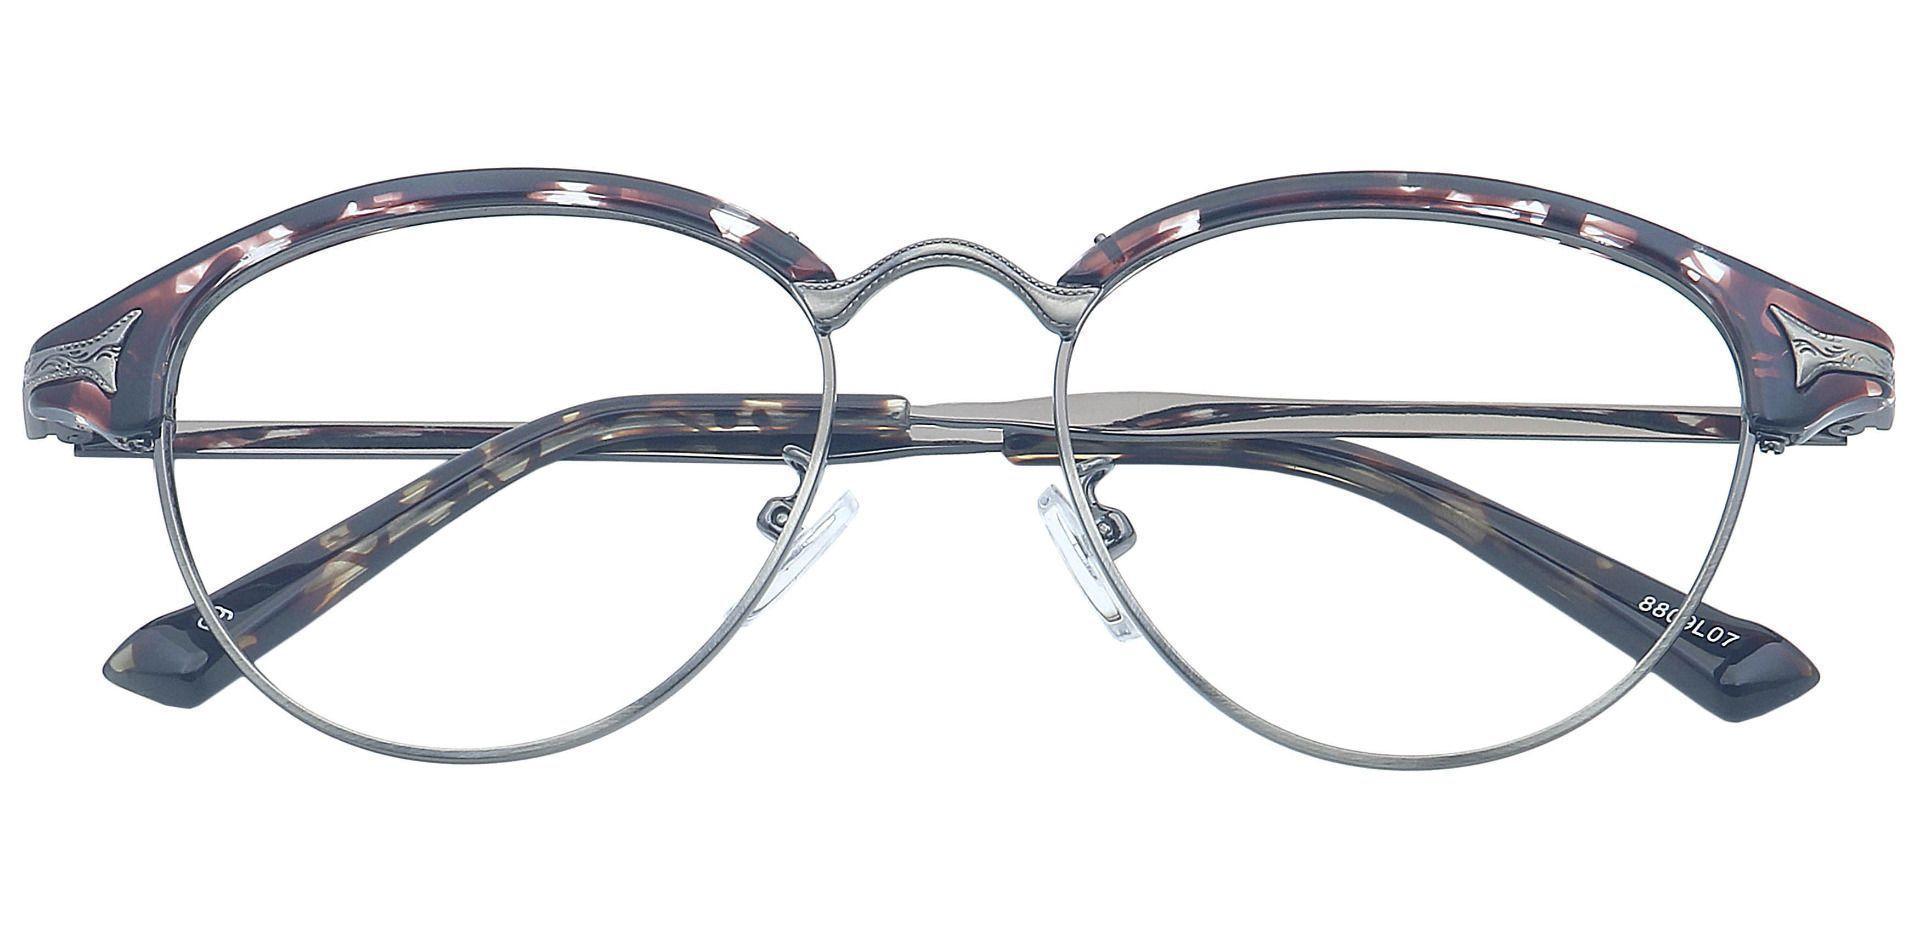 Regal Browline Single Vision Glasses - Leopard